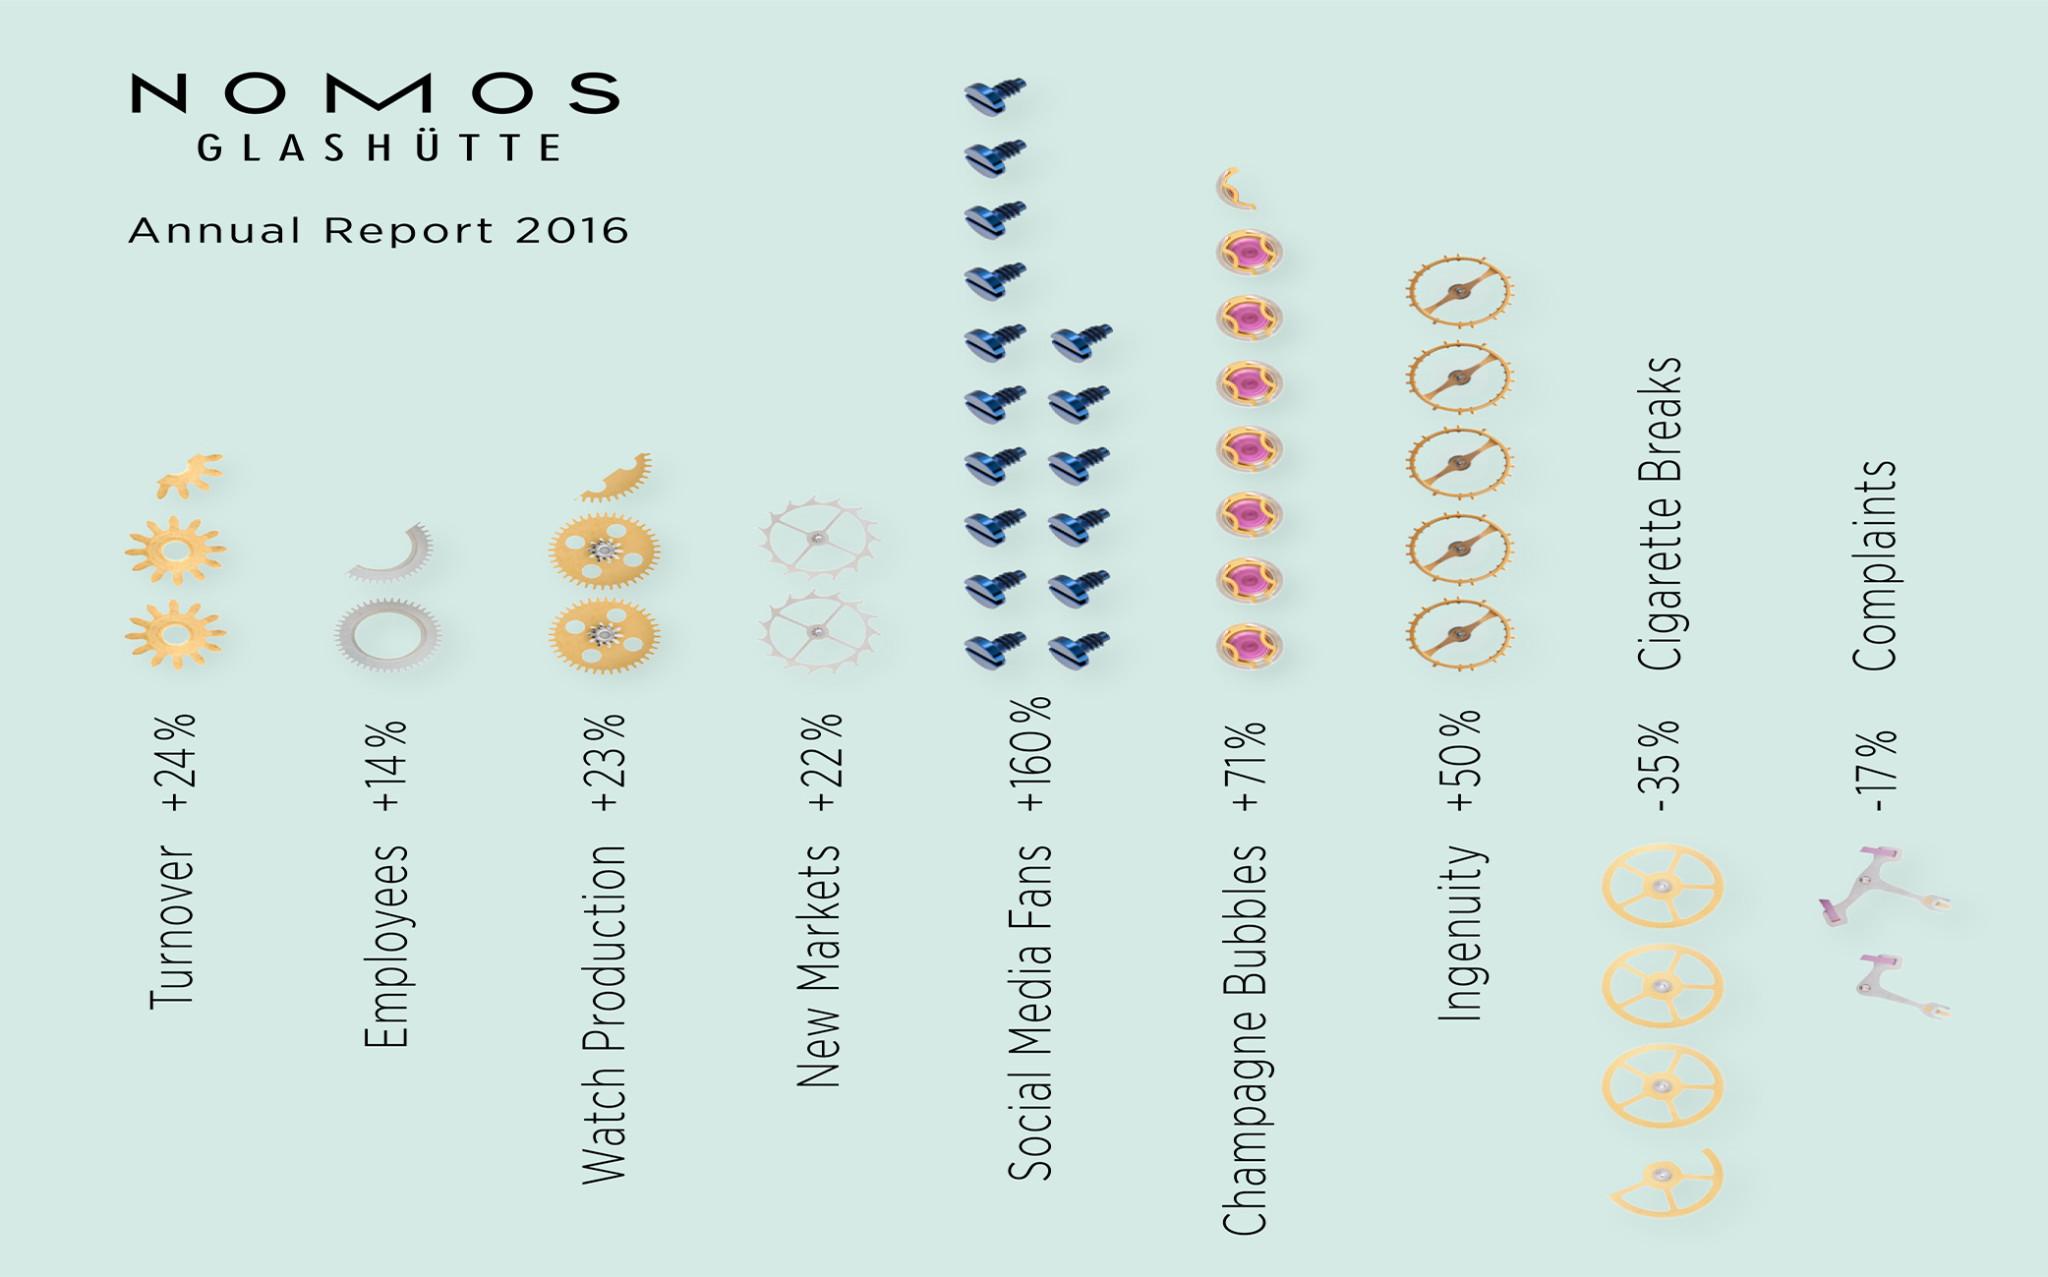 NOMOS_Infographic_Annual_Report